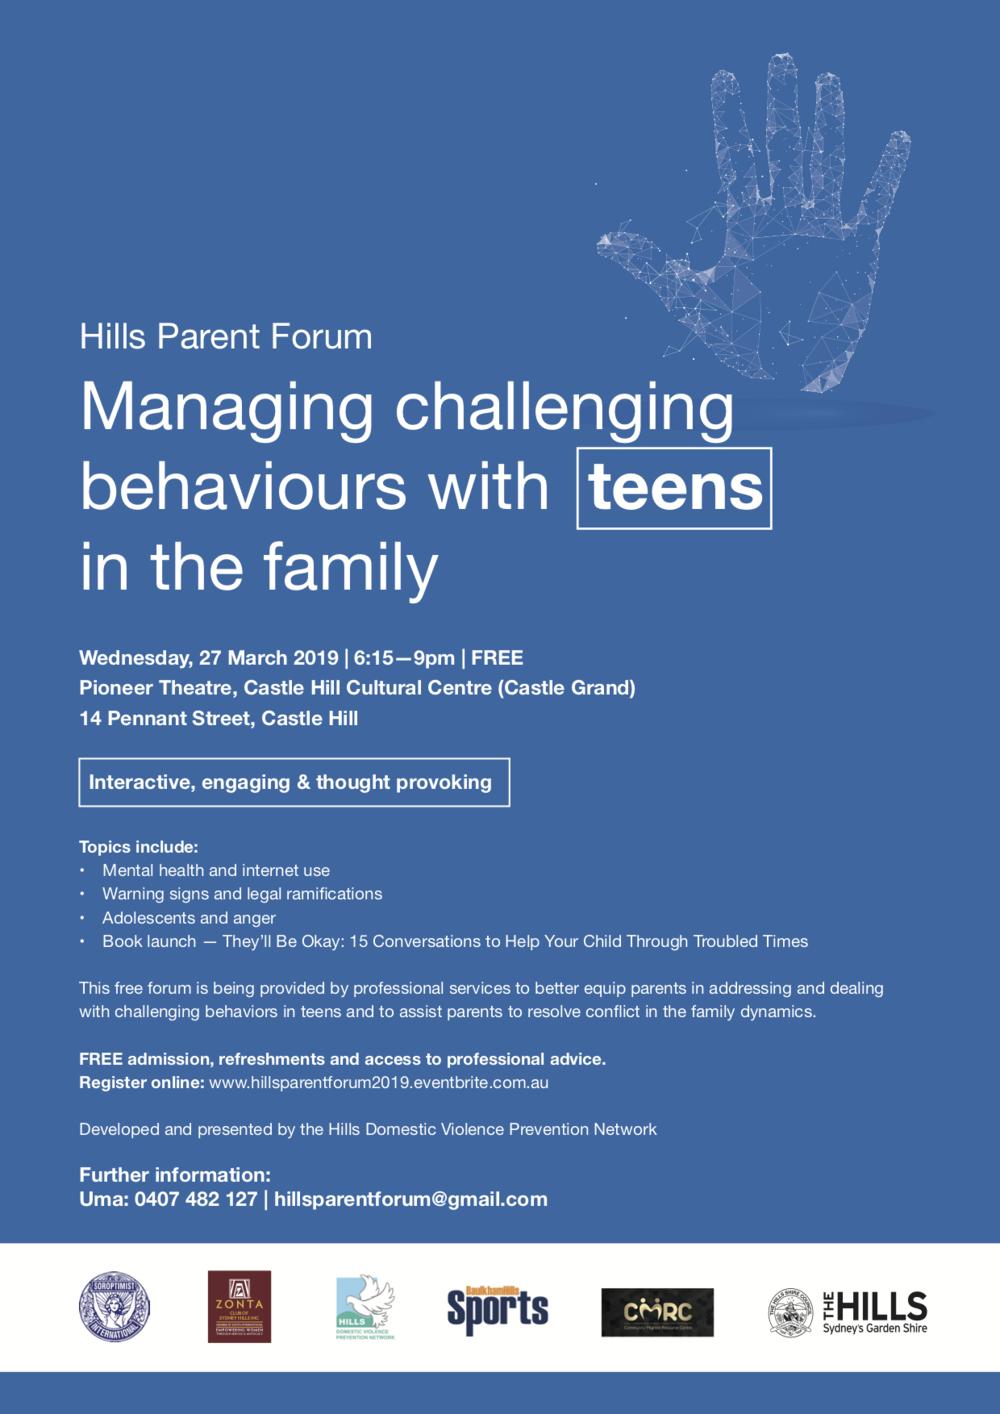 Hills Parent Forum Flyer 2019.png